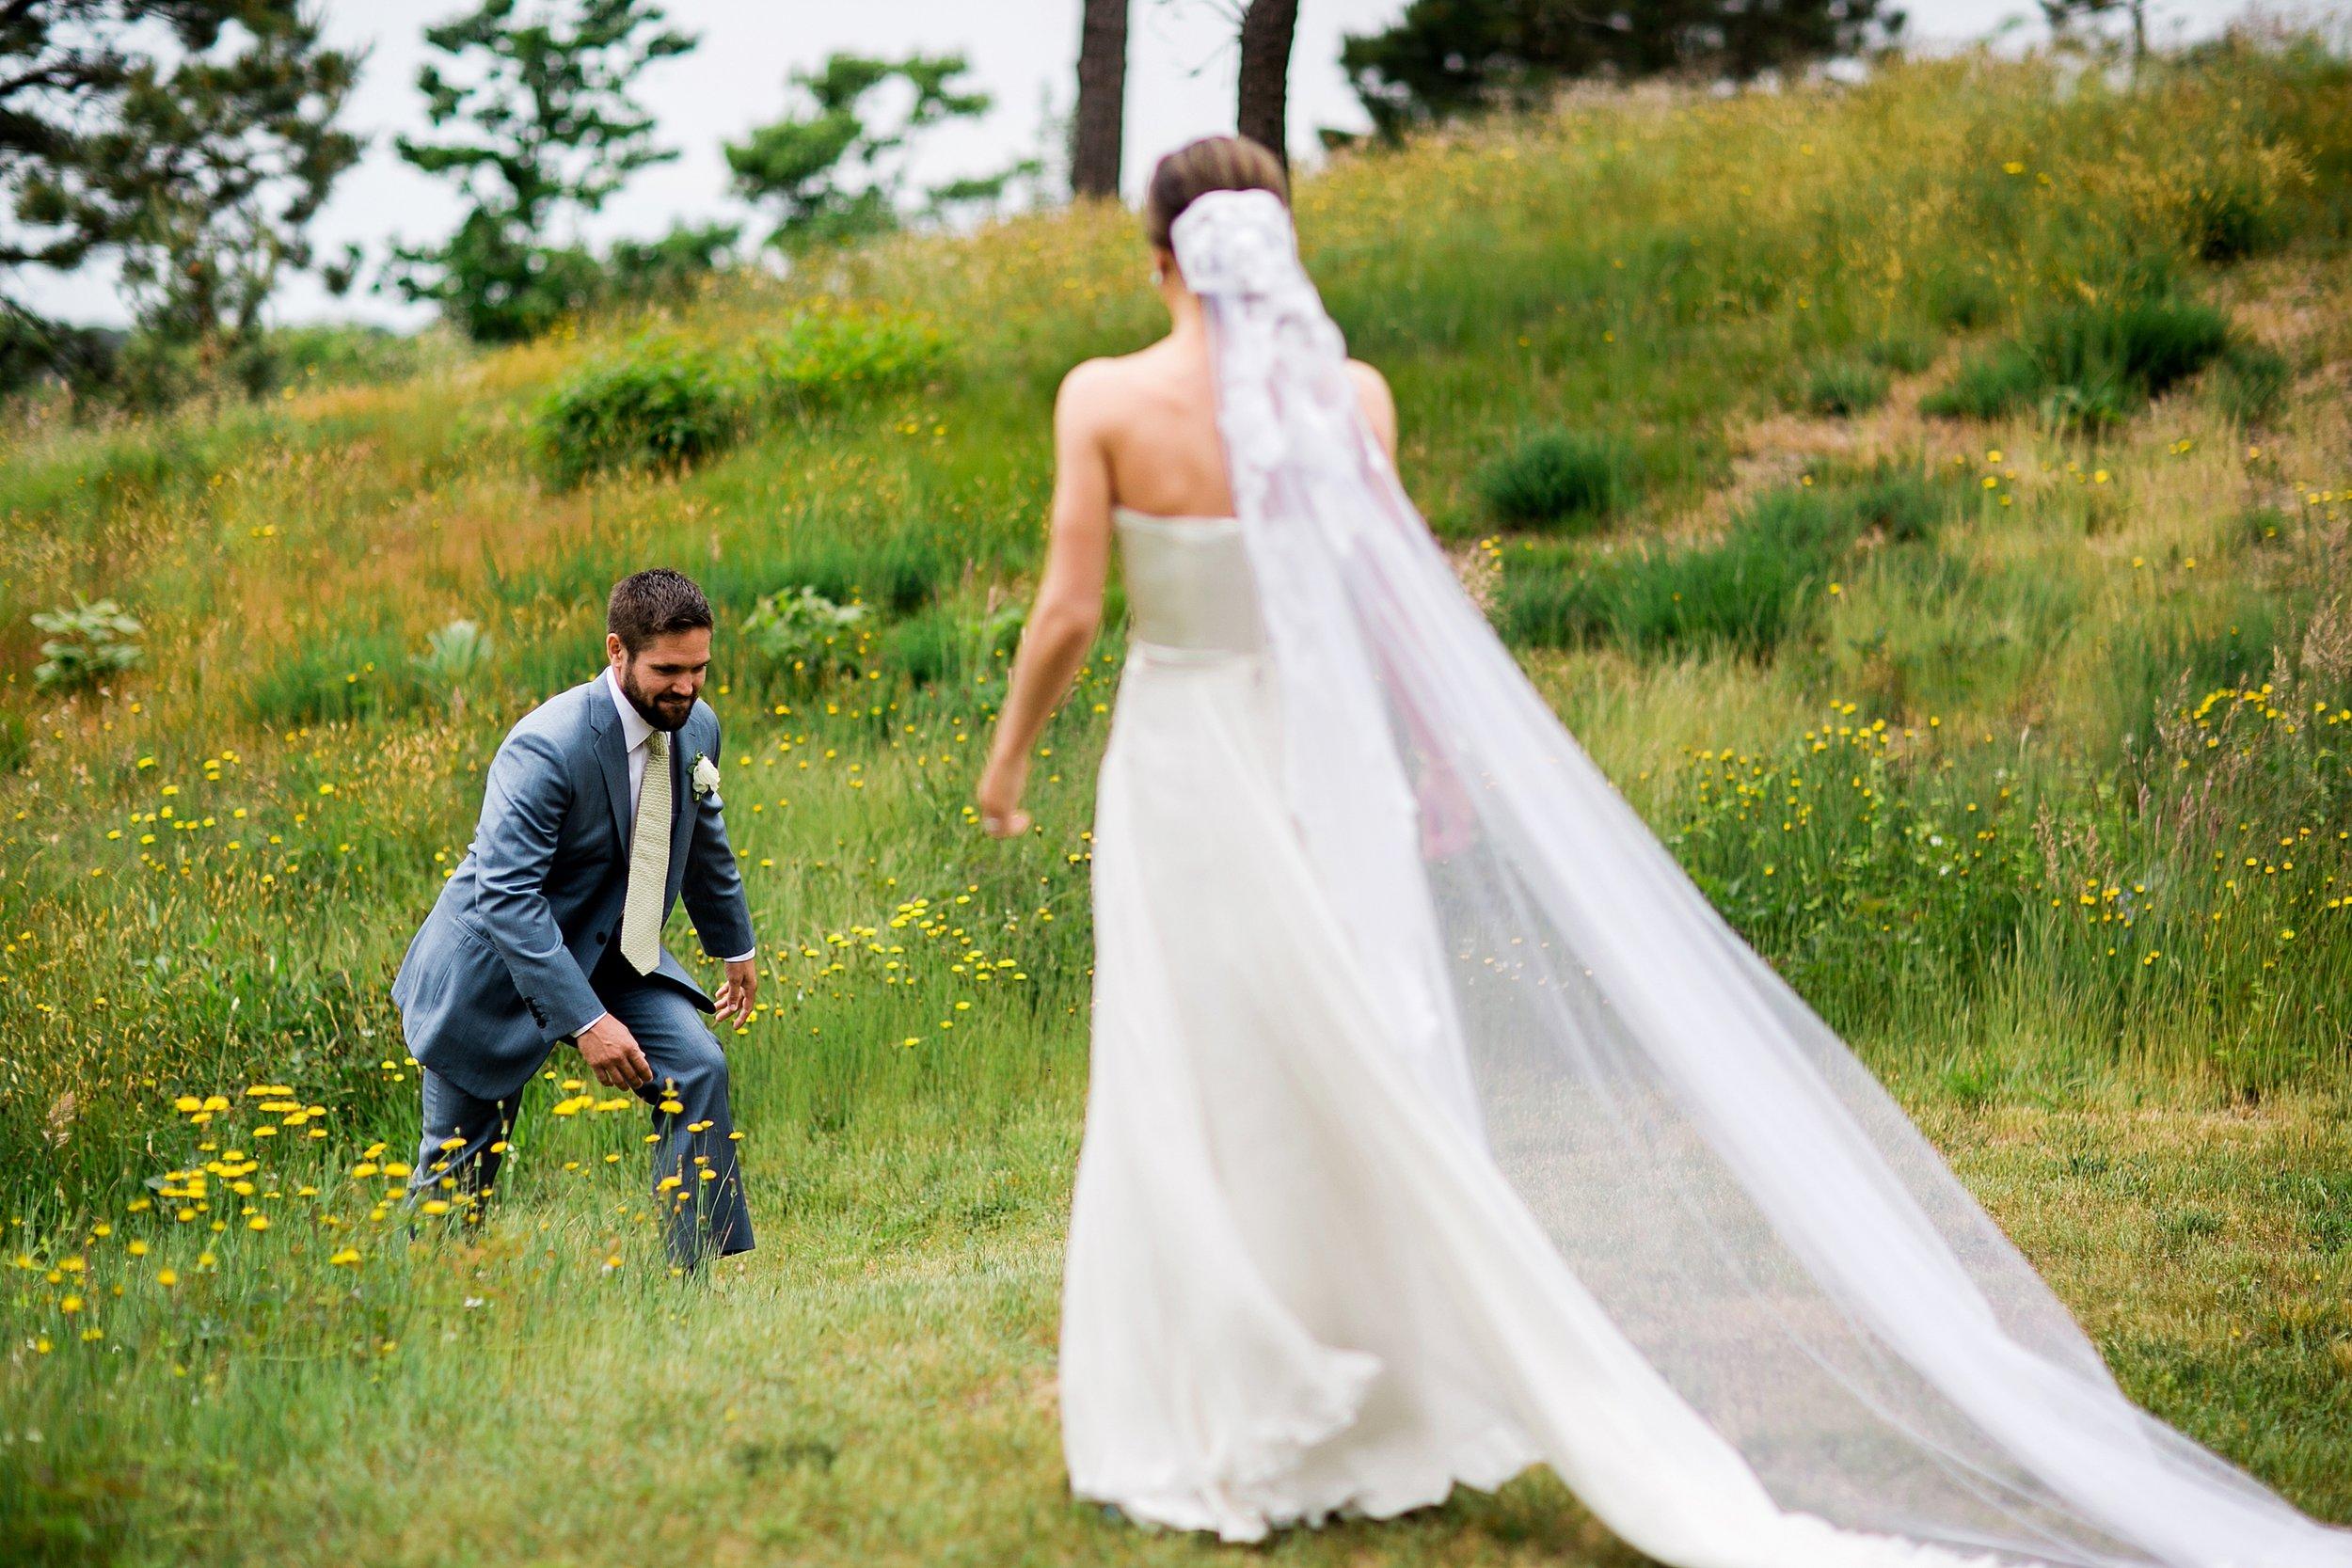 015 los angeles wedding photographer todd danforth photography cape cod.jpg